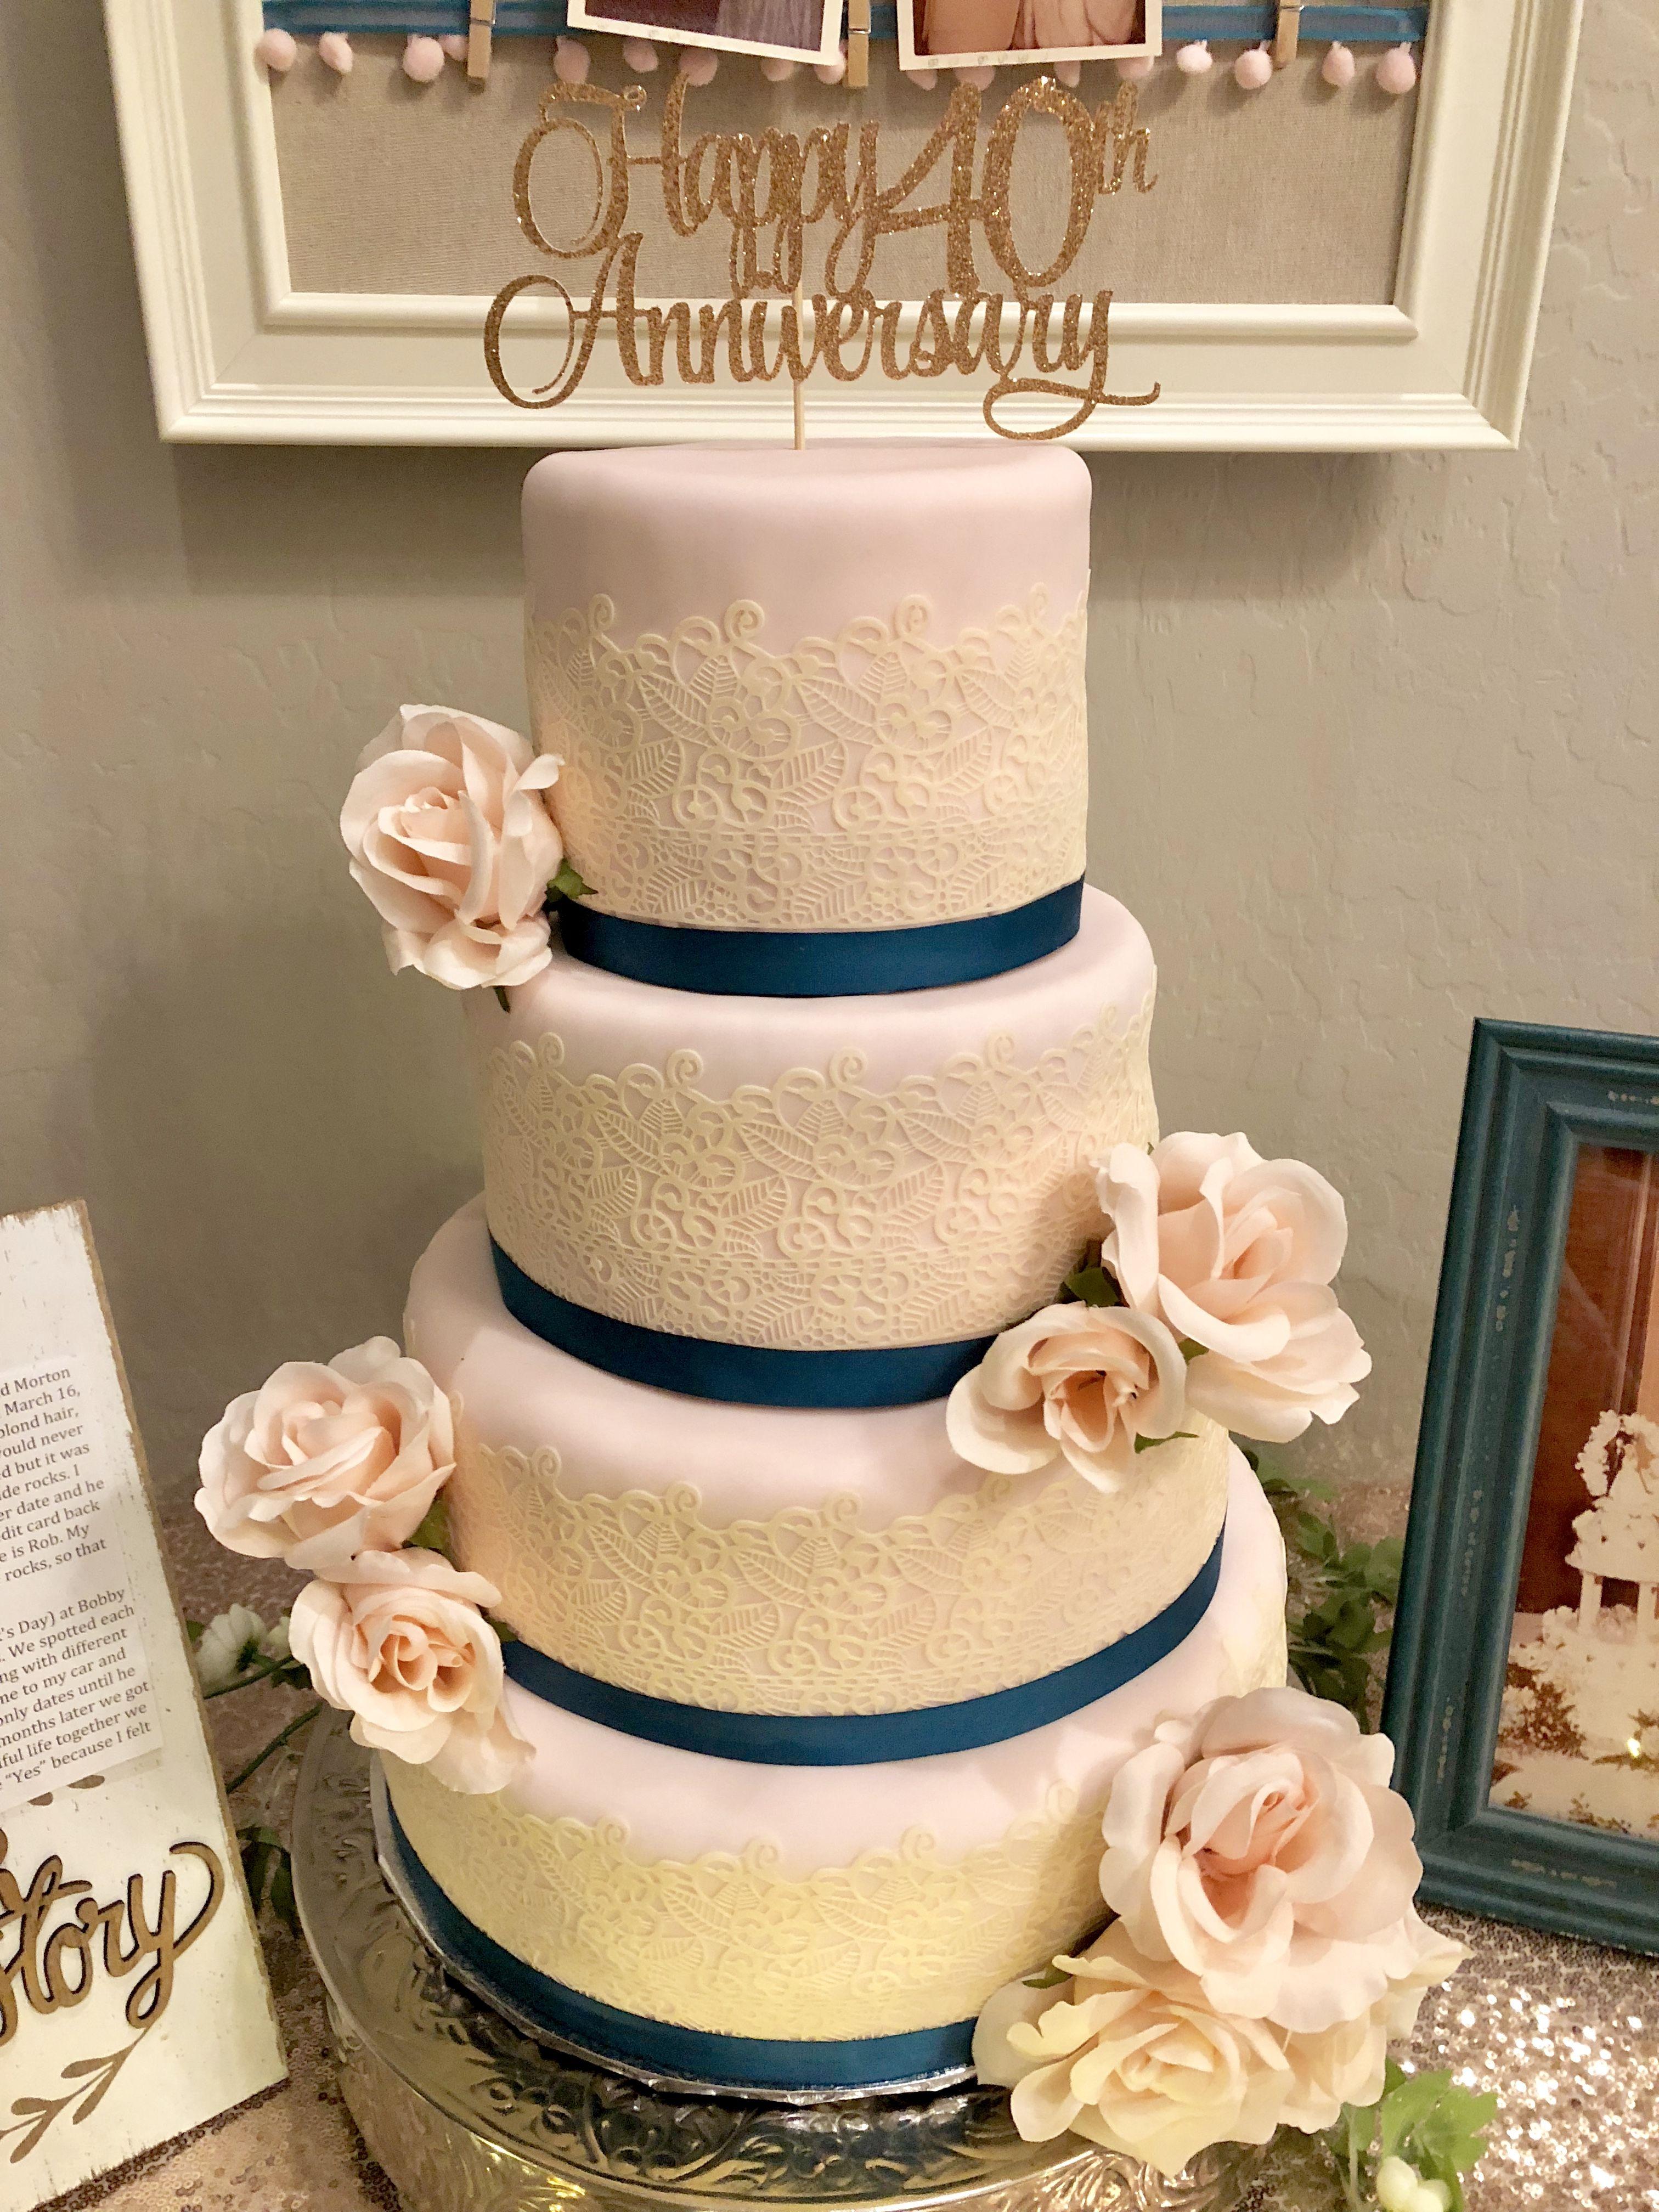 Edible lace wedding cake 40th wedding anniversary in 2020